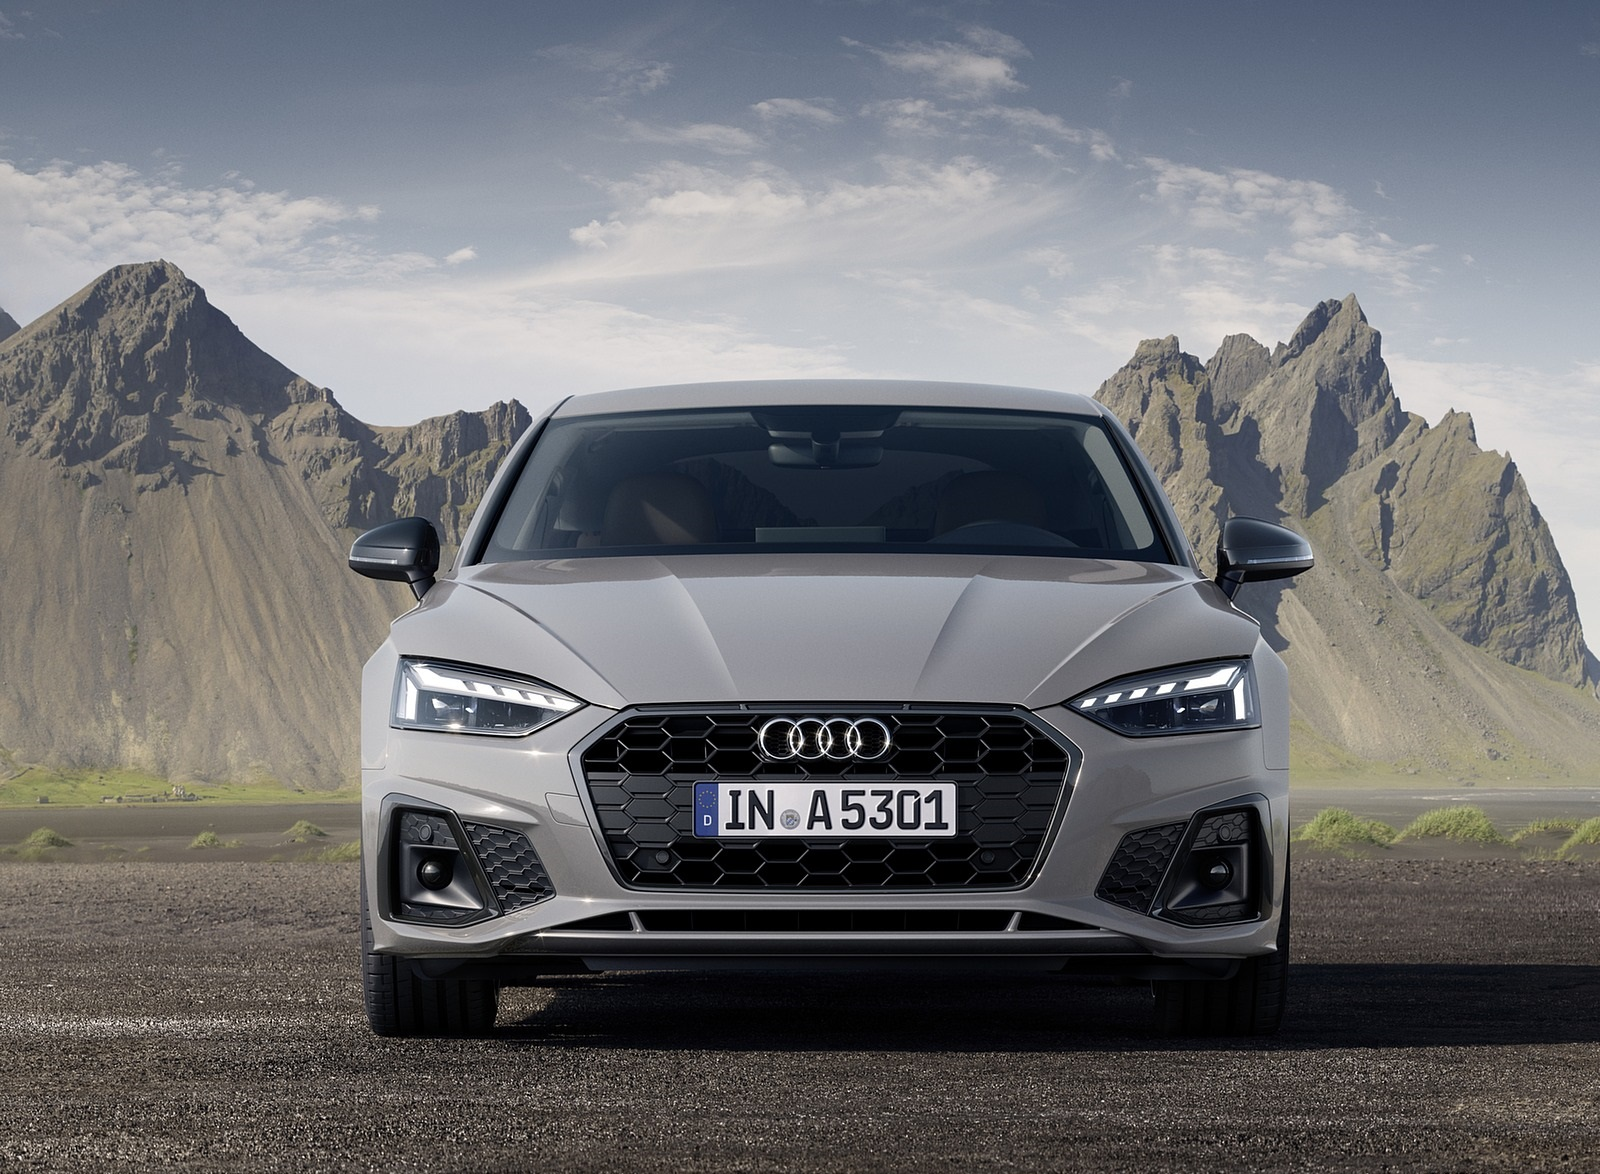 2020 Audi A5 Sportback (Color: Quantum Gray) Front Wallpapers (8)